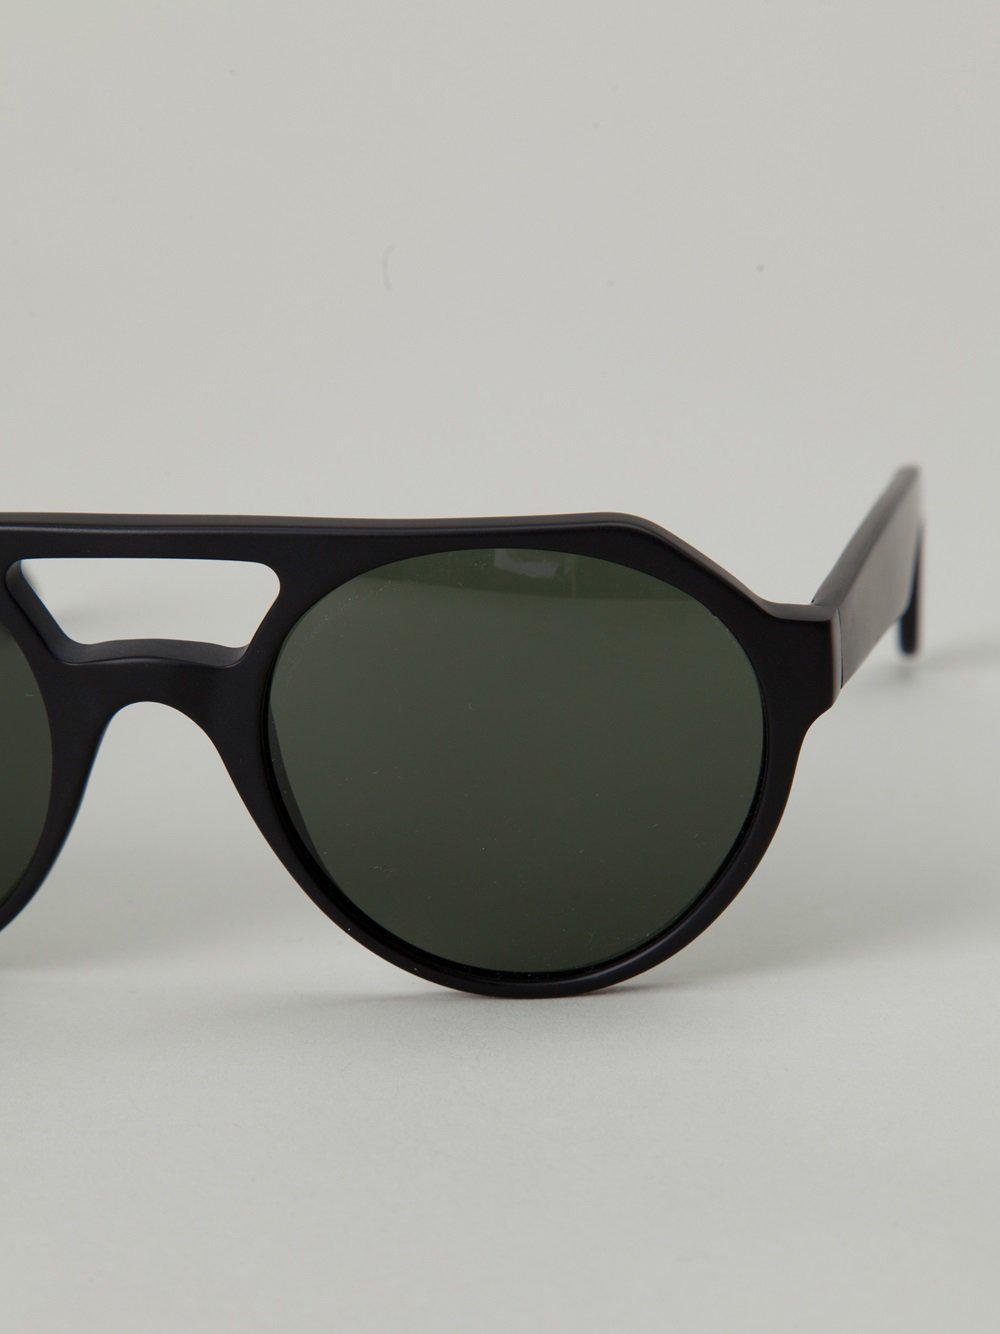 L.G.R Christian Rich Special Editon 'Cape Town' sunglasses Sneakernews Cheap Visa Payment GkKAmlT3cC